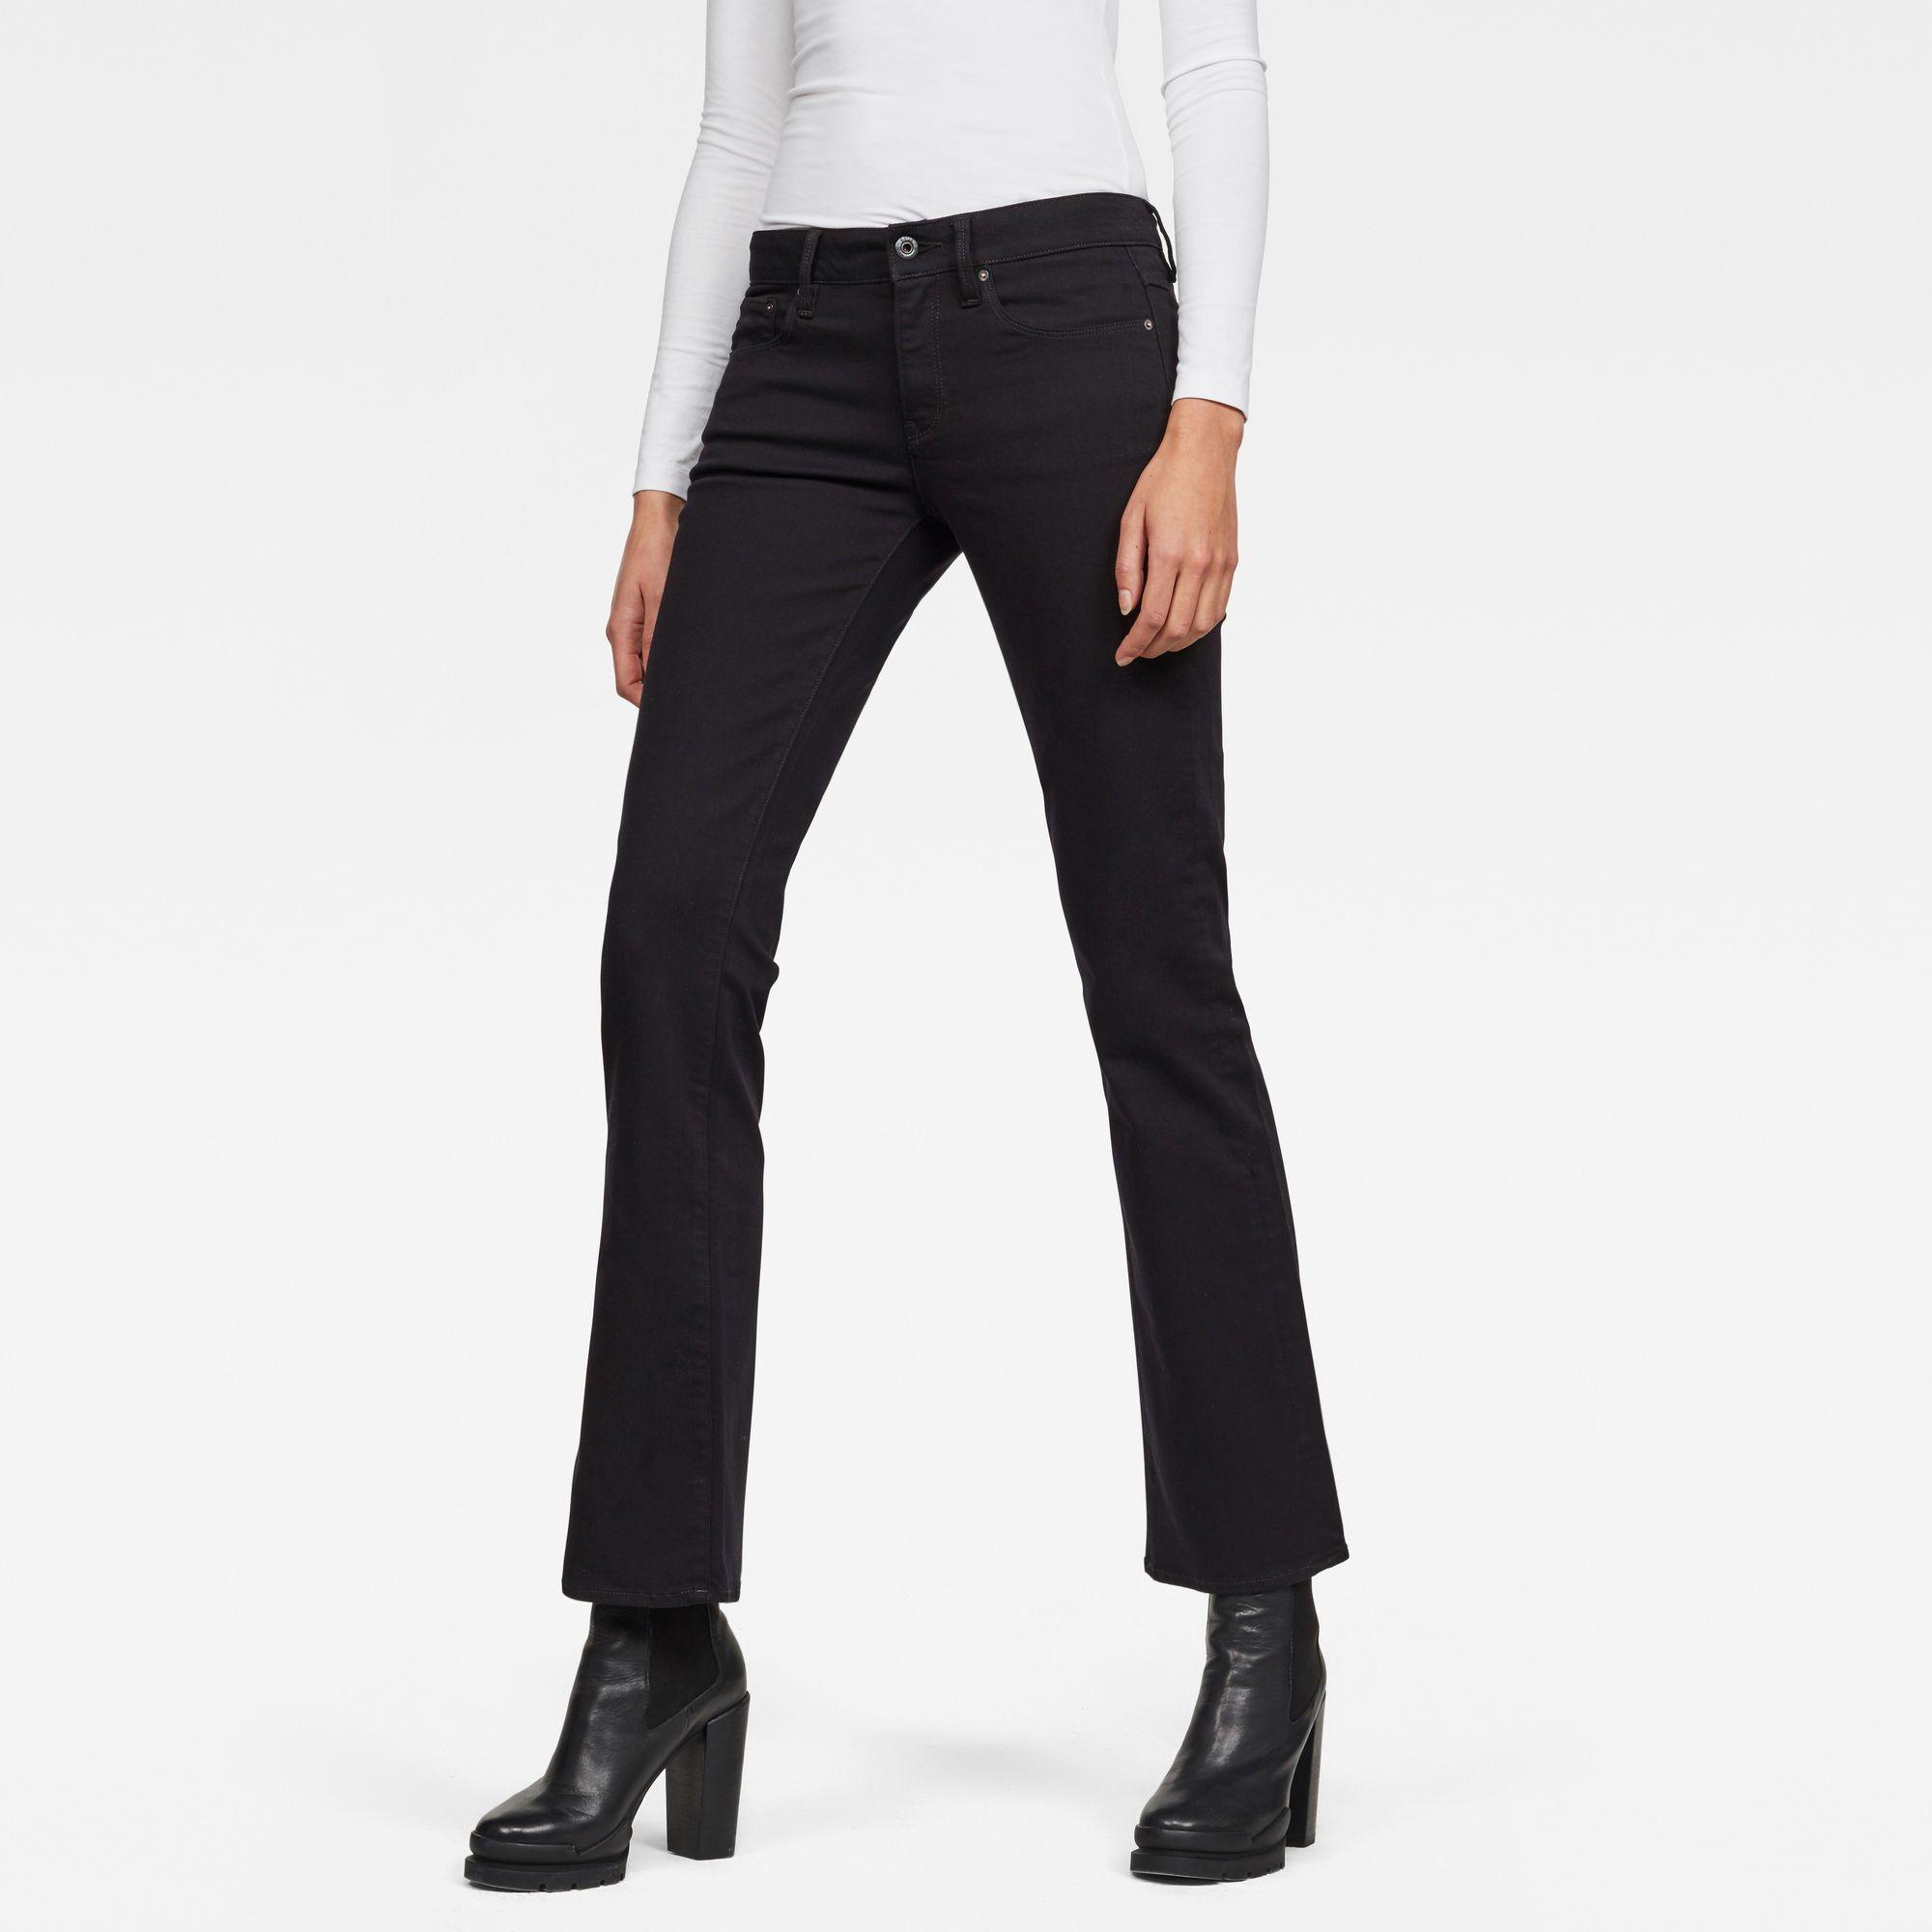 G-Star RAW 3301 Skinny Bootcut Jeans